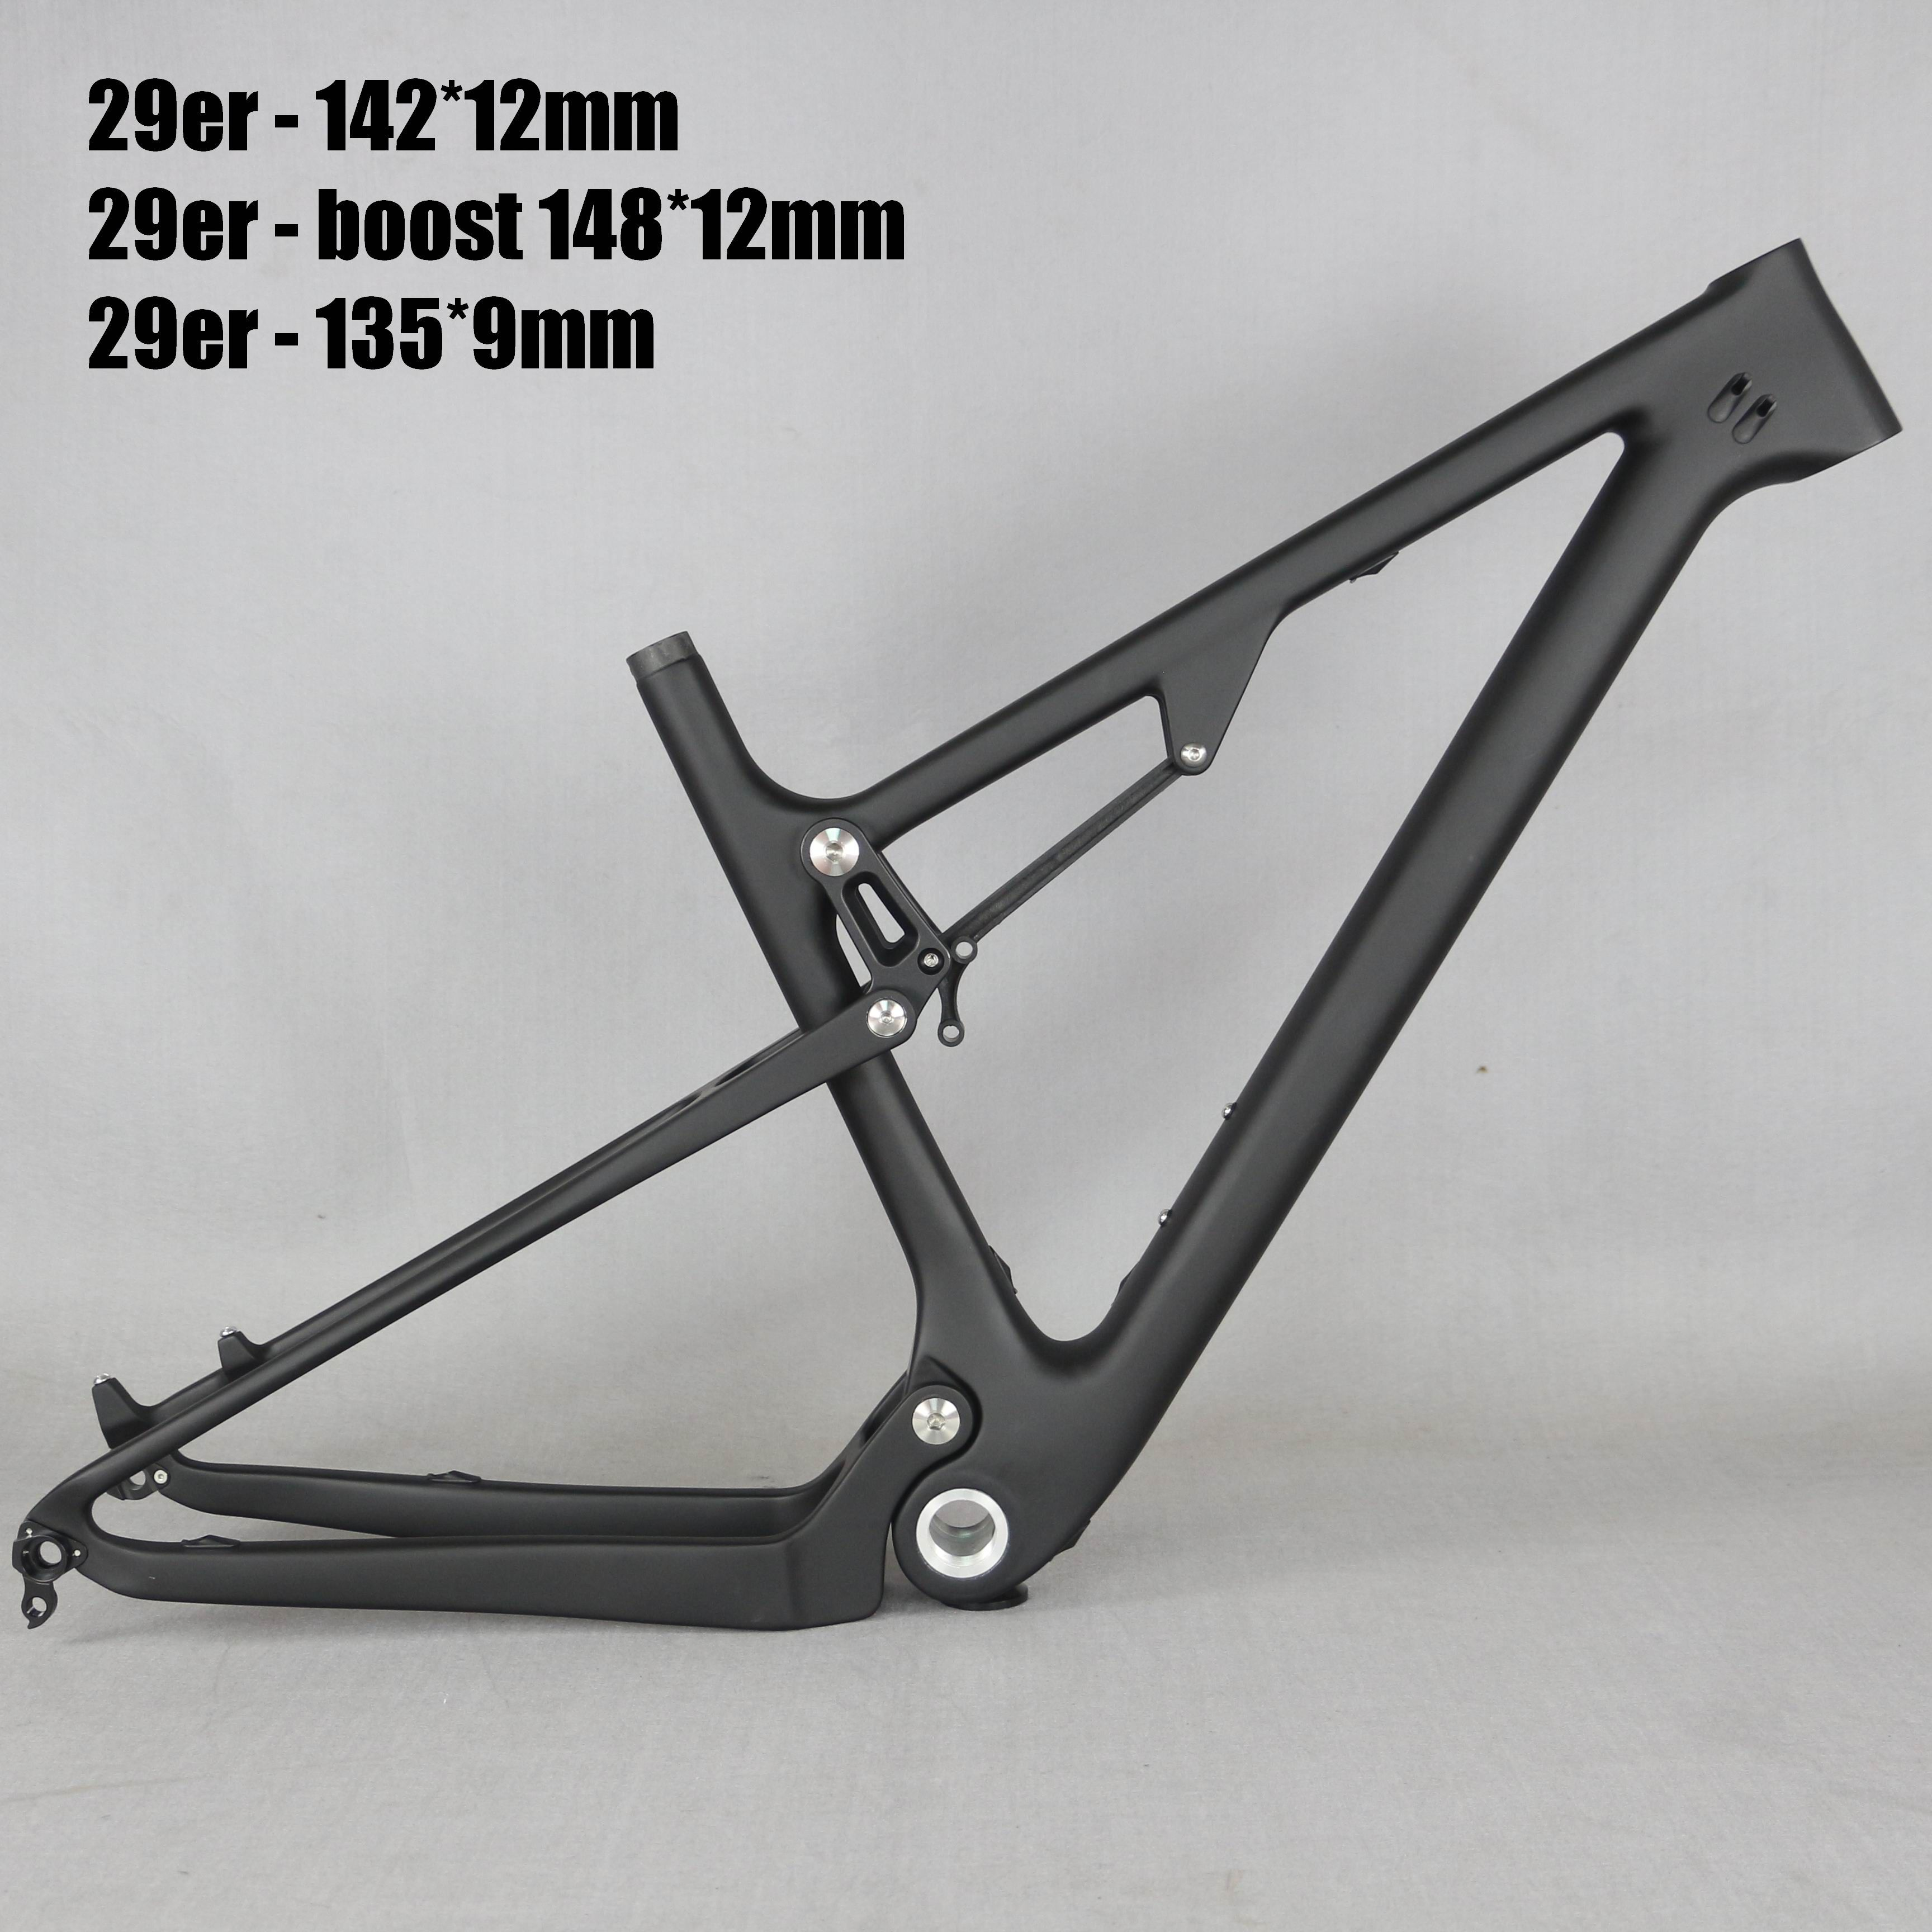 29 volle Suspension 142*12mm MTB Fahrrad Carbon rahmen 29er mit 135*9mm/29er boost suspension 148*12 mountainbike rahmen FM078